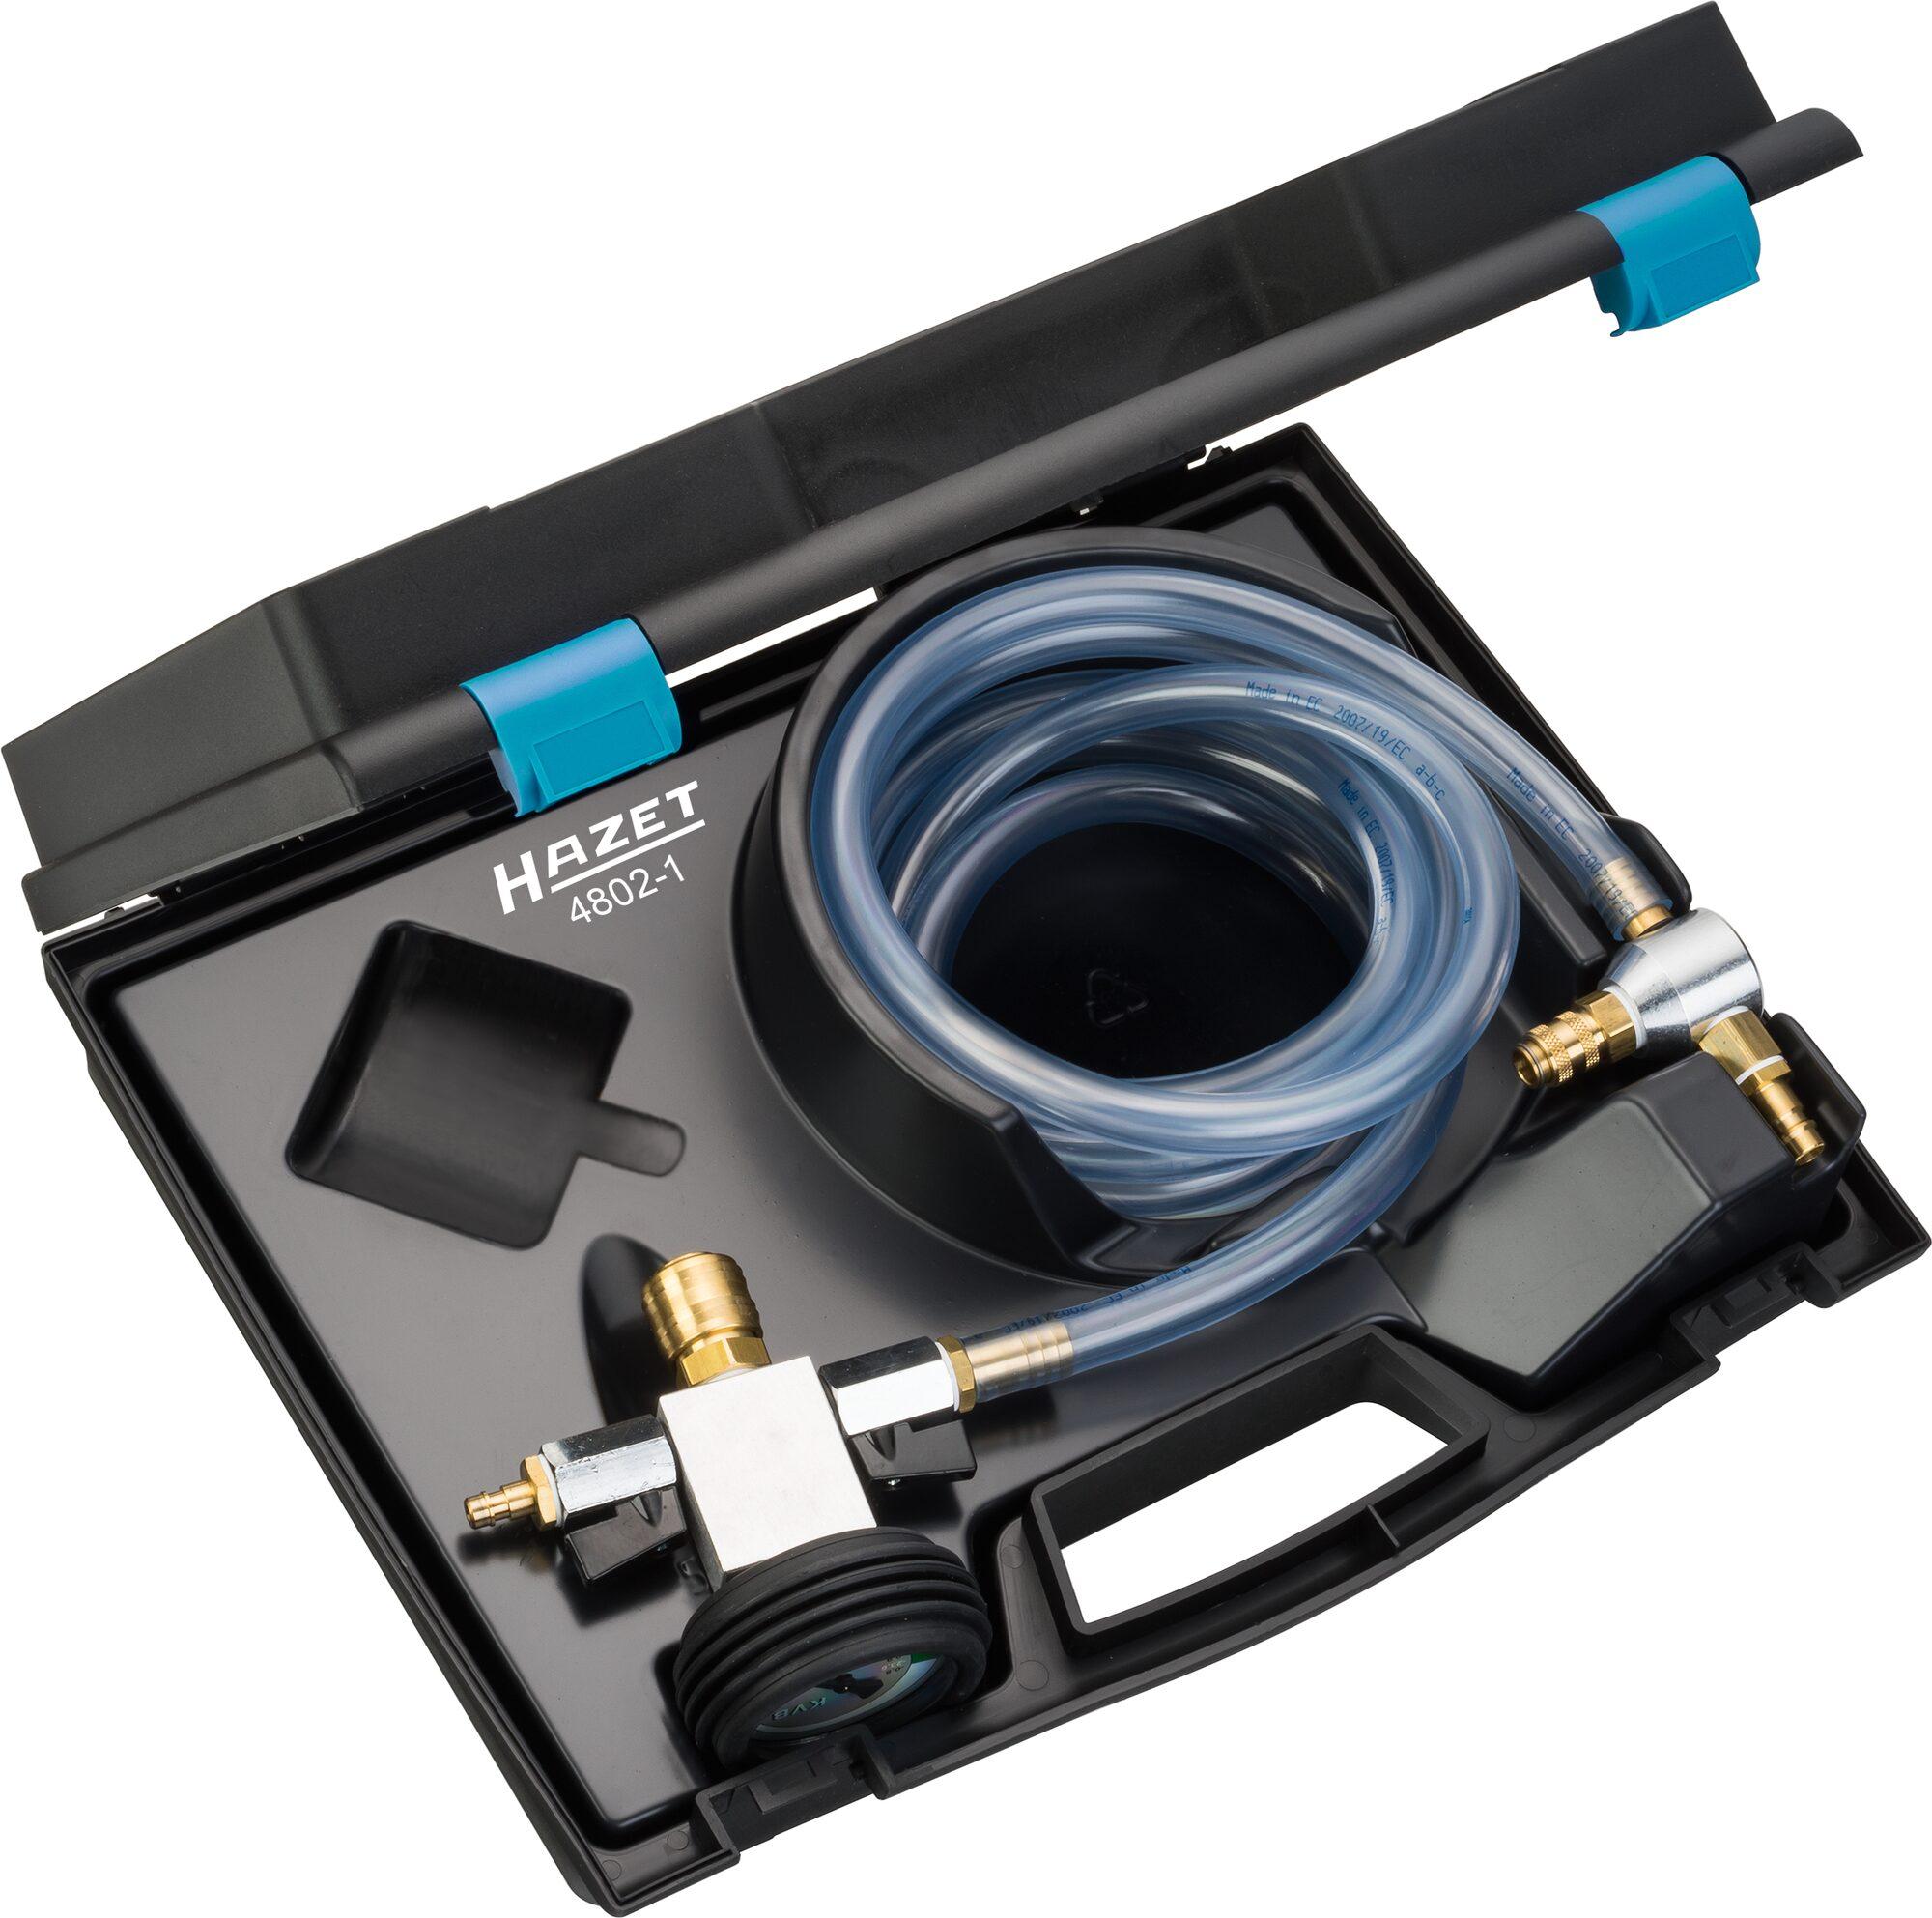 HAZET Nkw Kühler-Vakuum Befüllgerät 4802-1